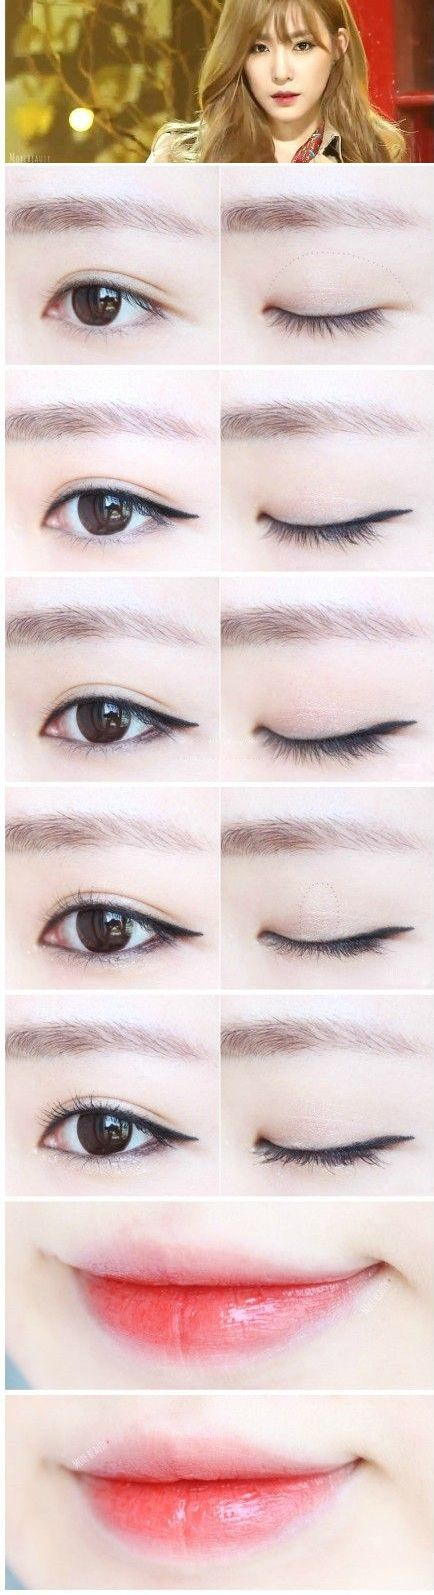 Doll-Like Makeup